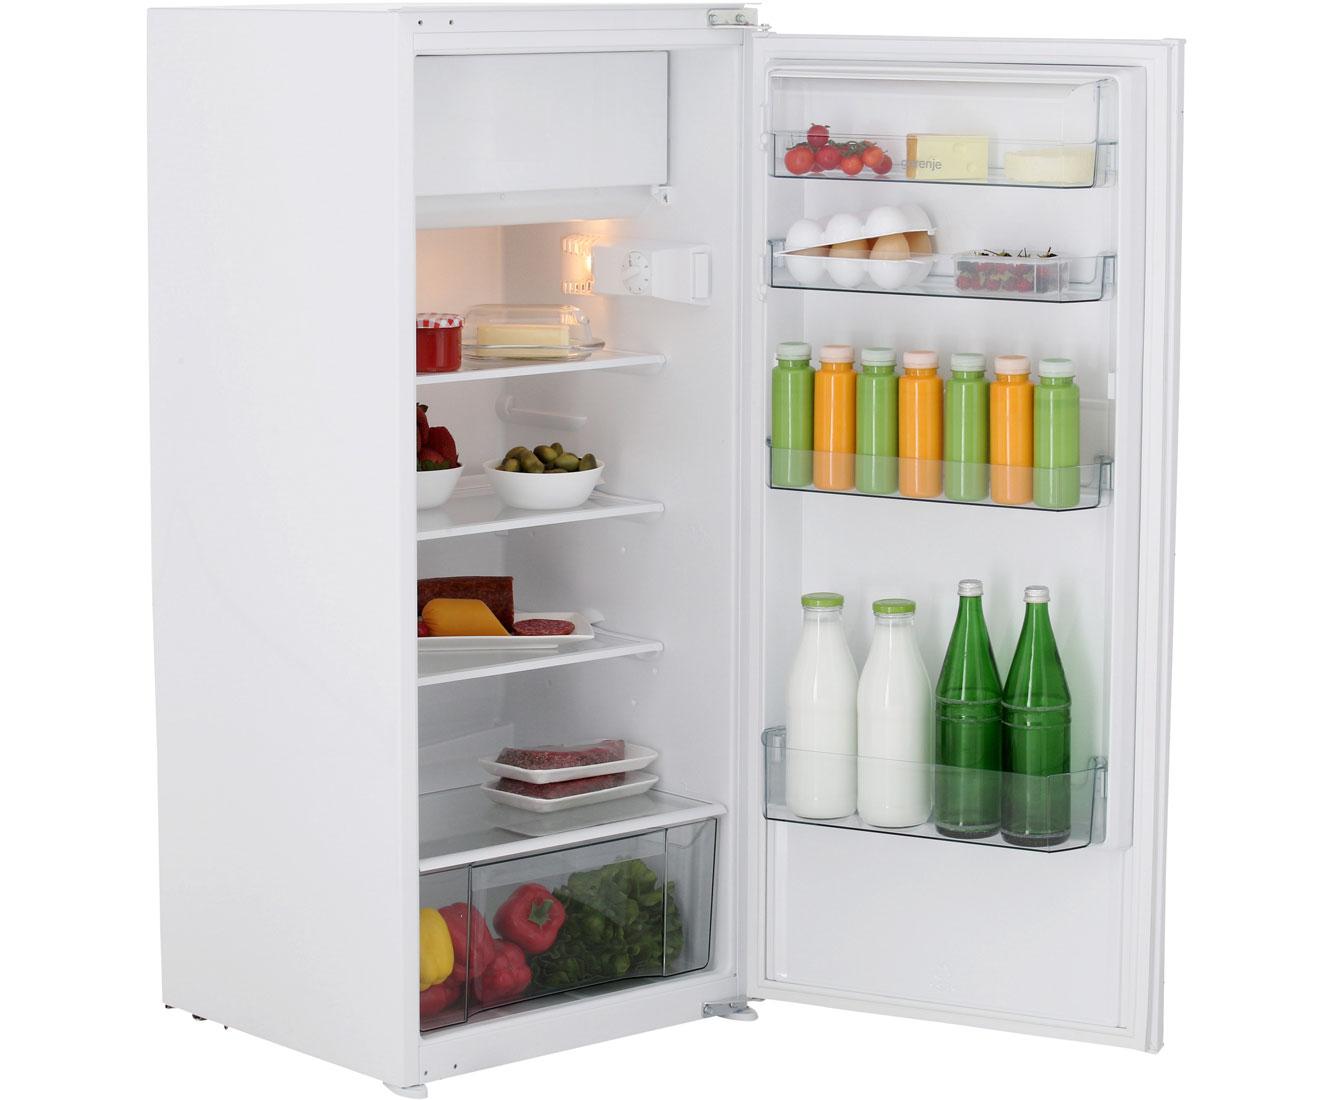 Retro Doppel Kühlschrank : Doppel kühlschrank kühlschrank doppeltür elegant wunderbar bilder